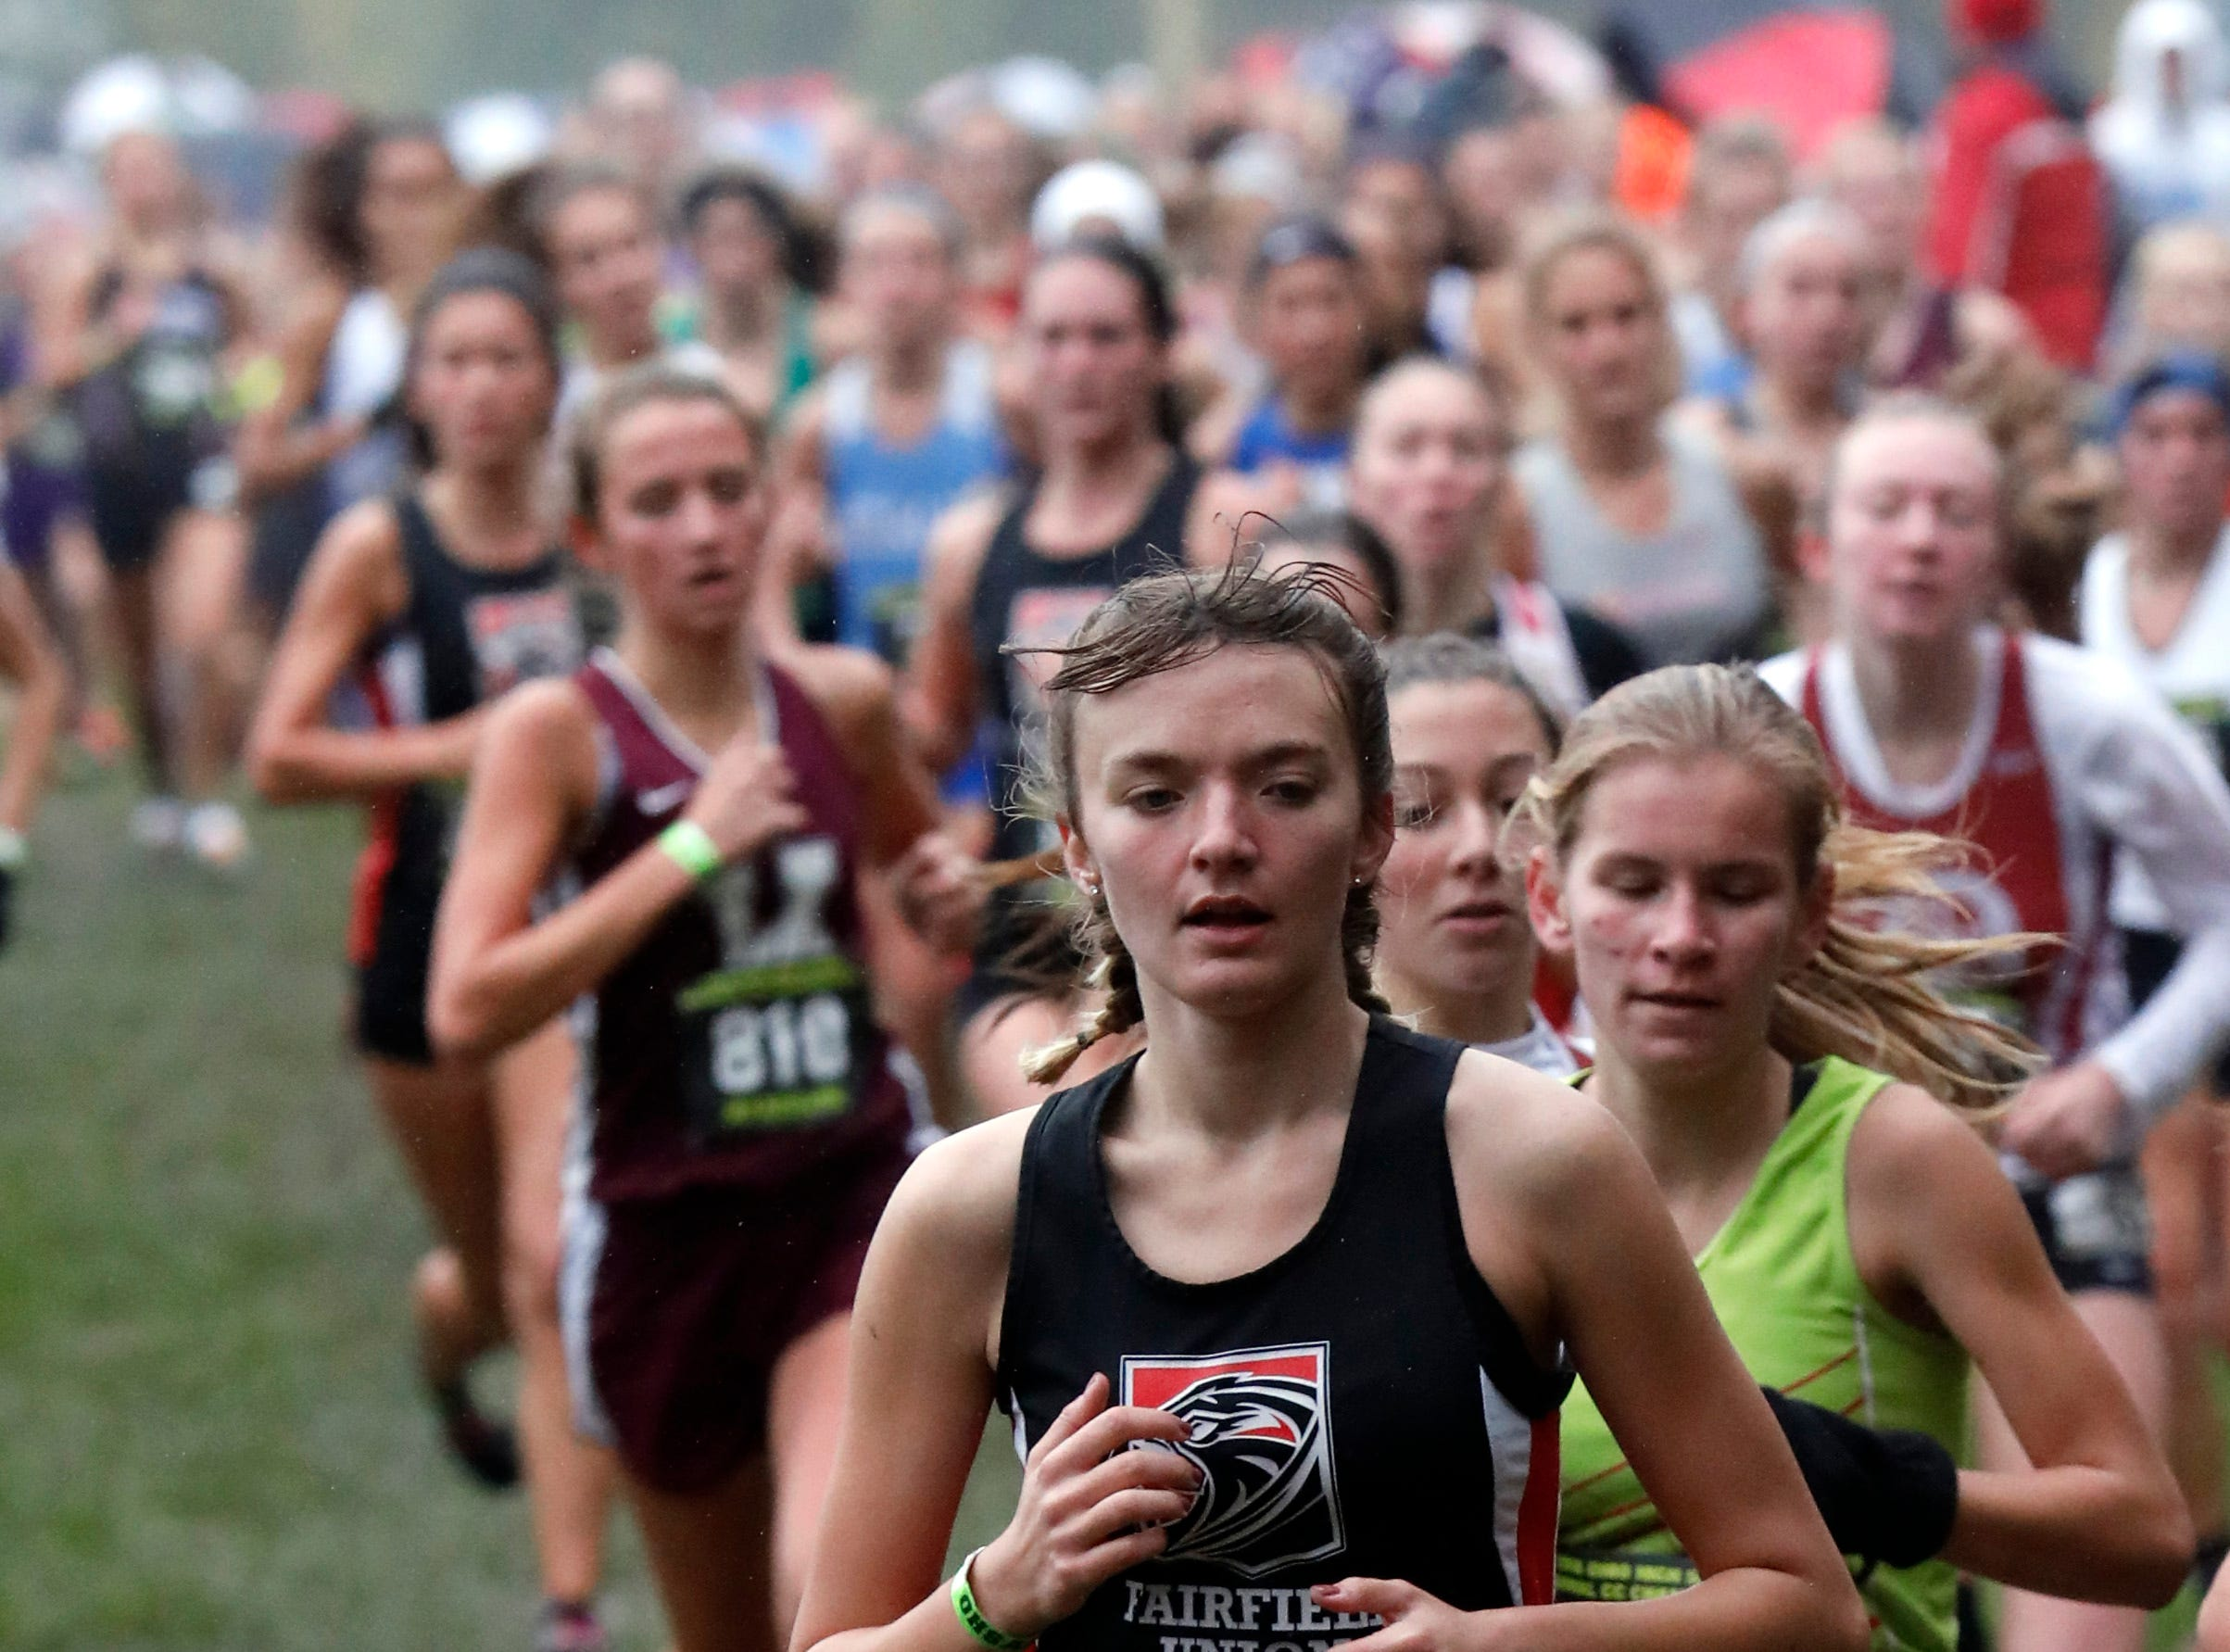 Fairfield Union's Heather Lecrone runs in the Regional Cross Country meet Saturday, Oct. 27, 2018, at Pickerington North High School in Pickerington.